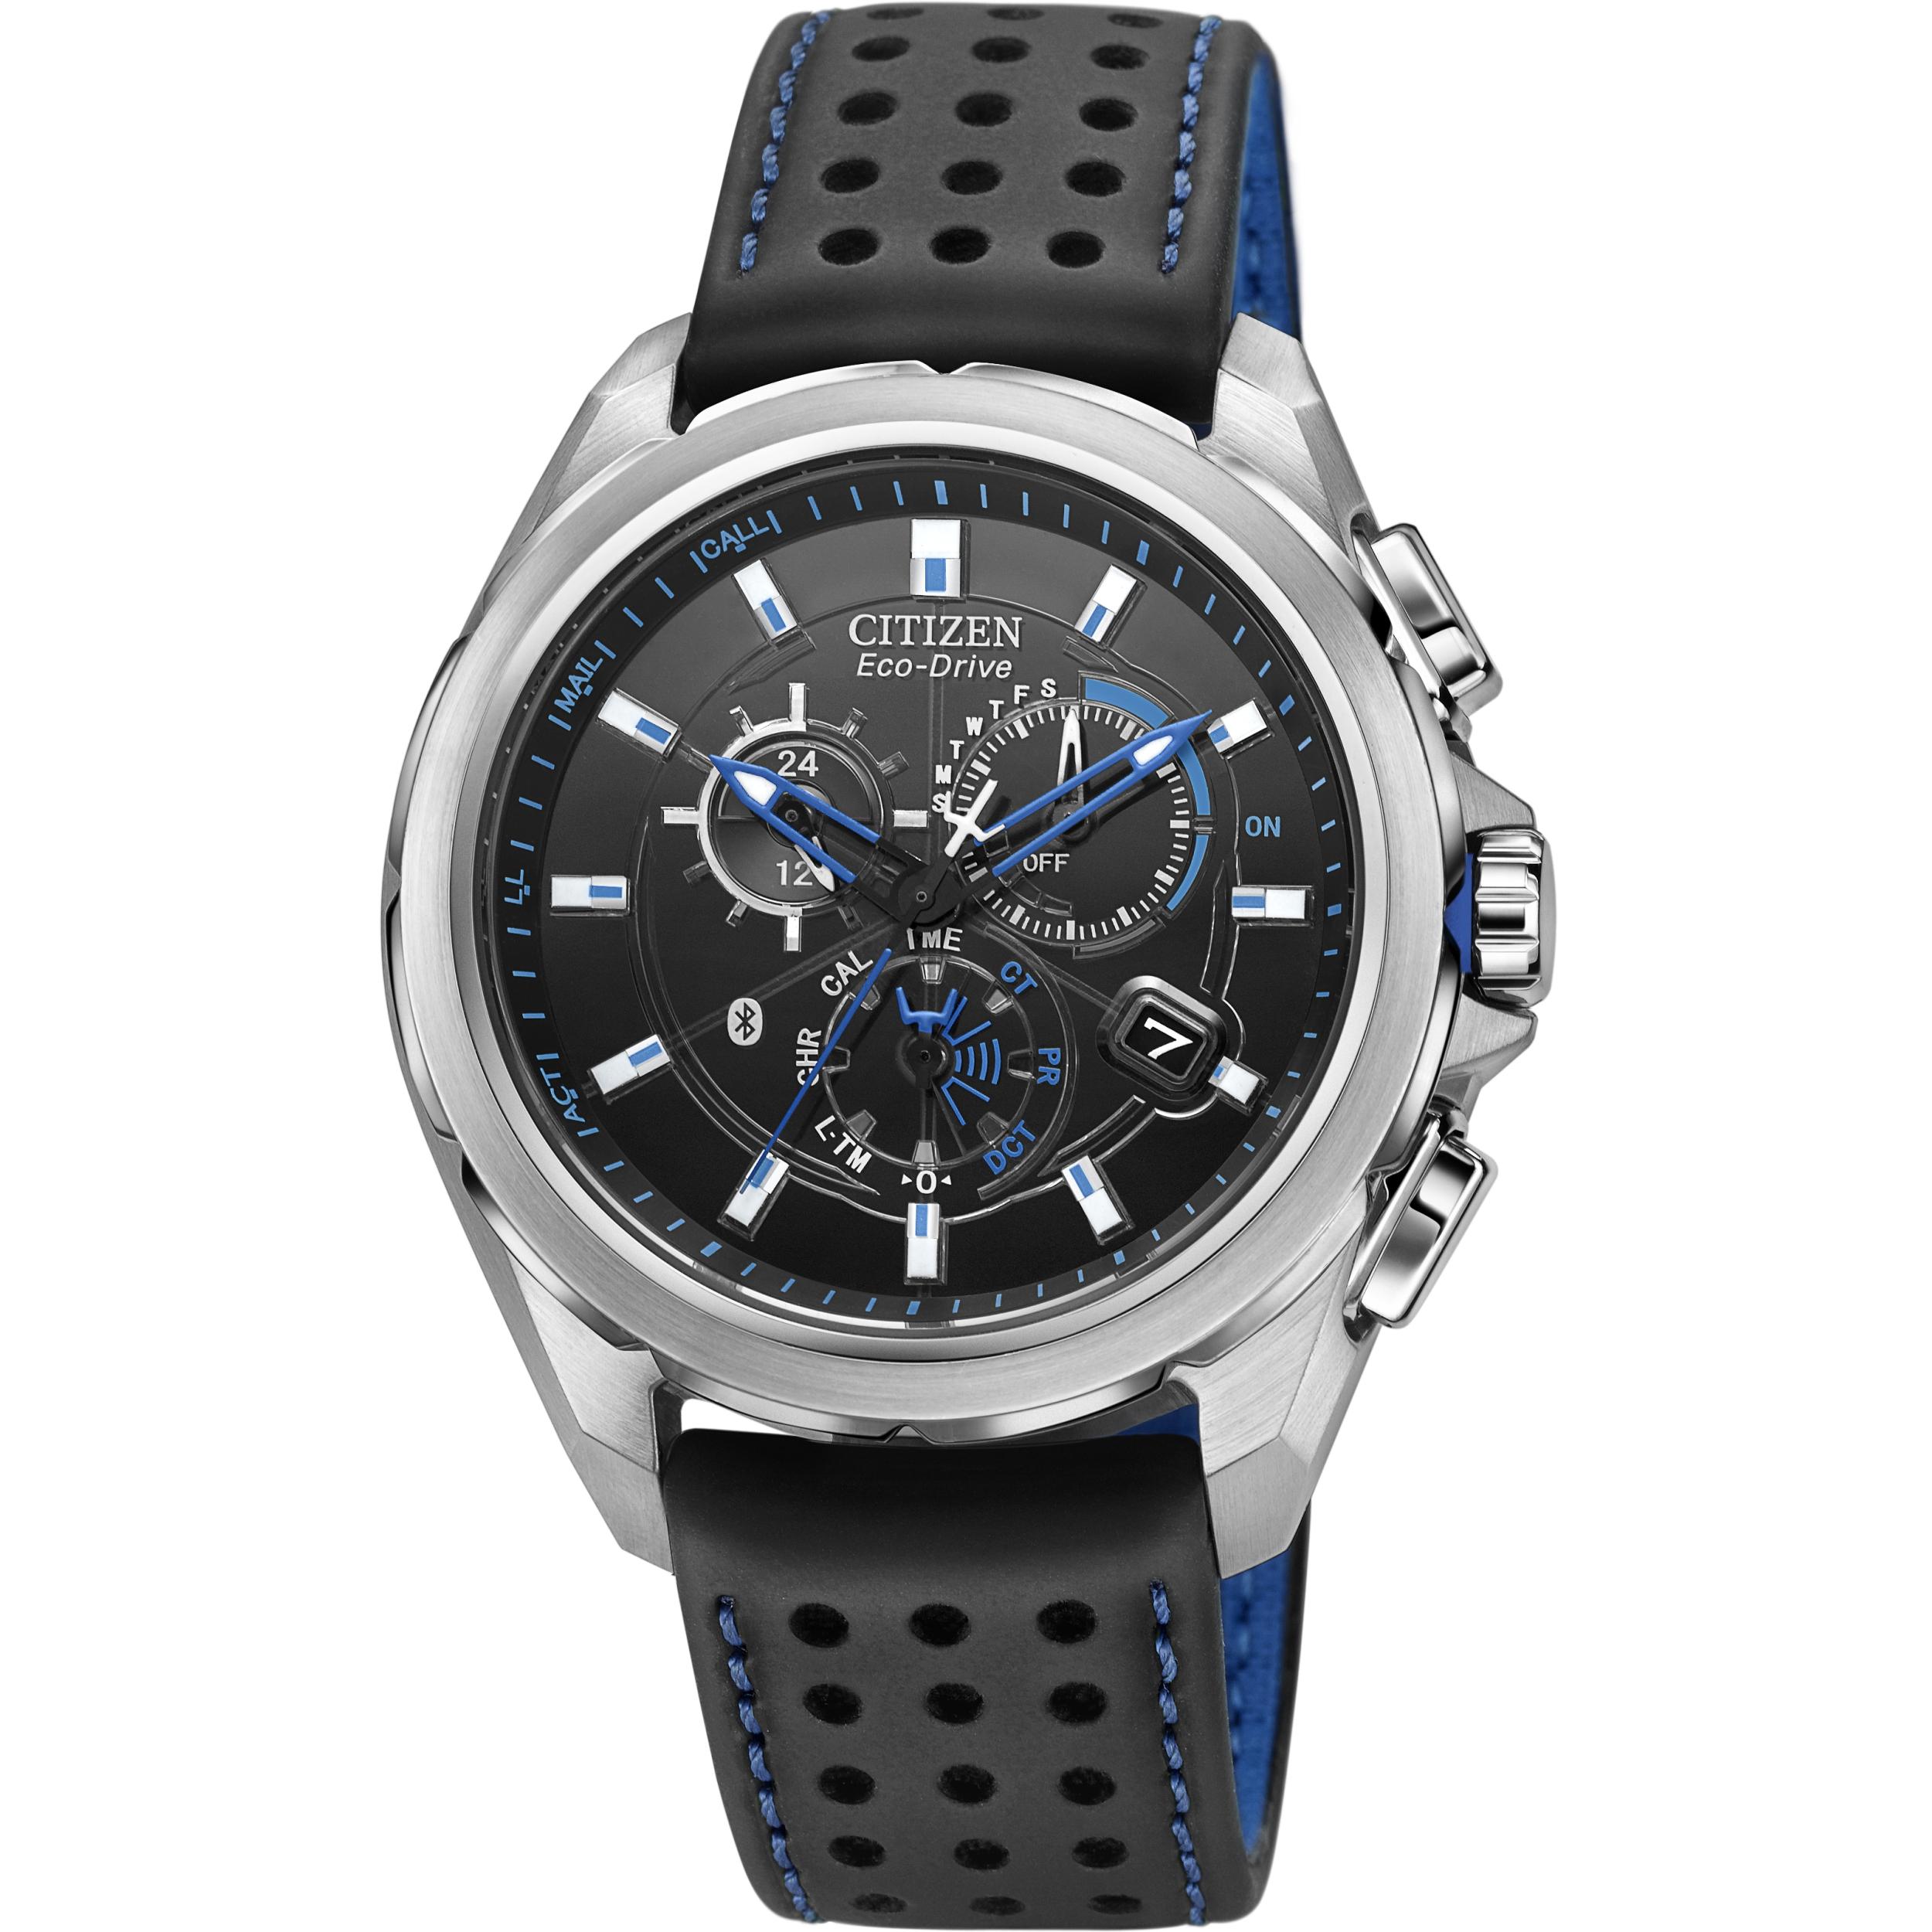 gents citizen proximity bluetooth chronograph watch at7030 05e rh watchshop com citizen proximity w760 manual citizen eco drive w760 manual